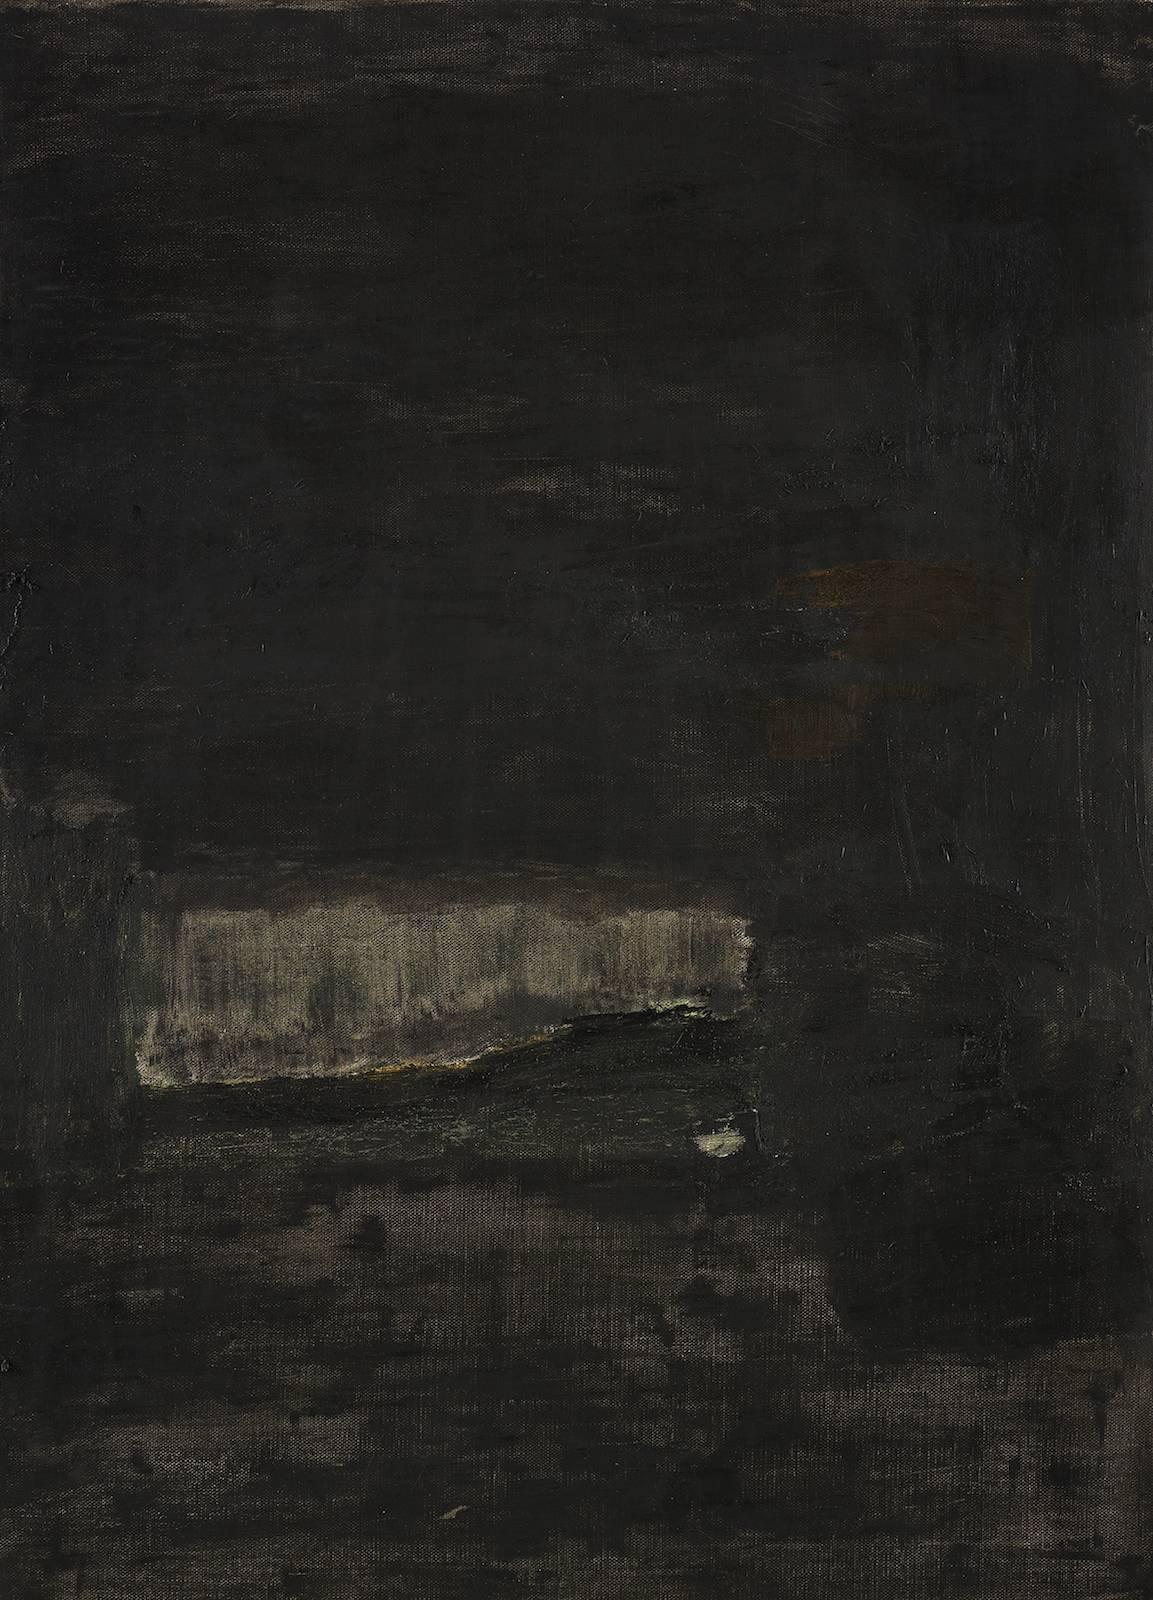 Landskap, 2012, oil on canvas, 98 x 70 cm